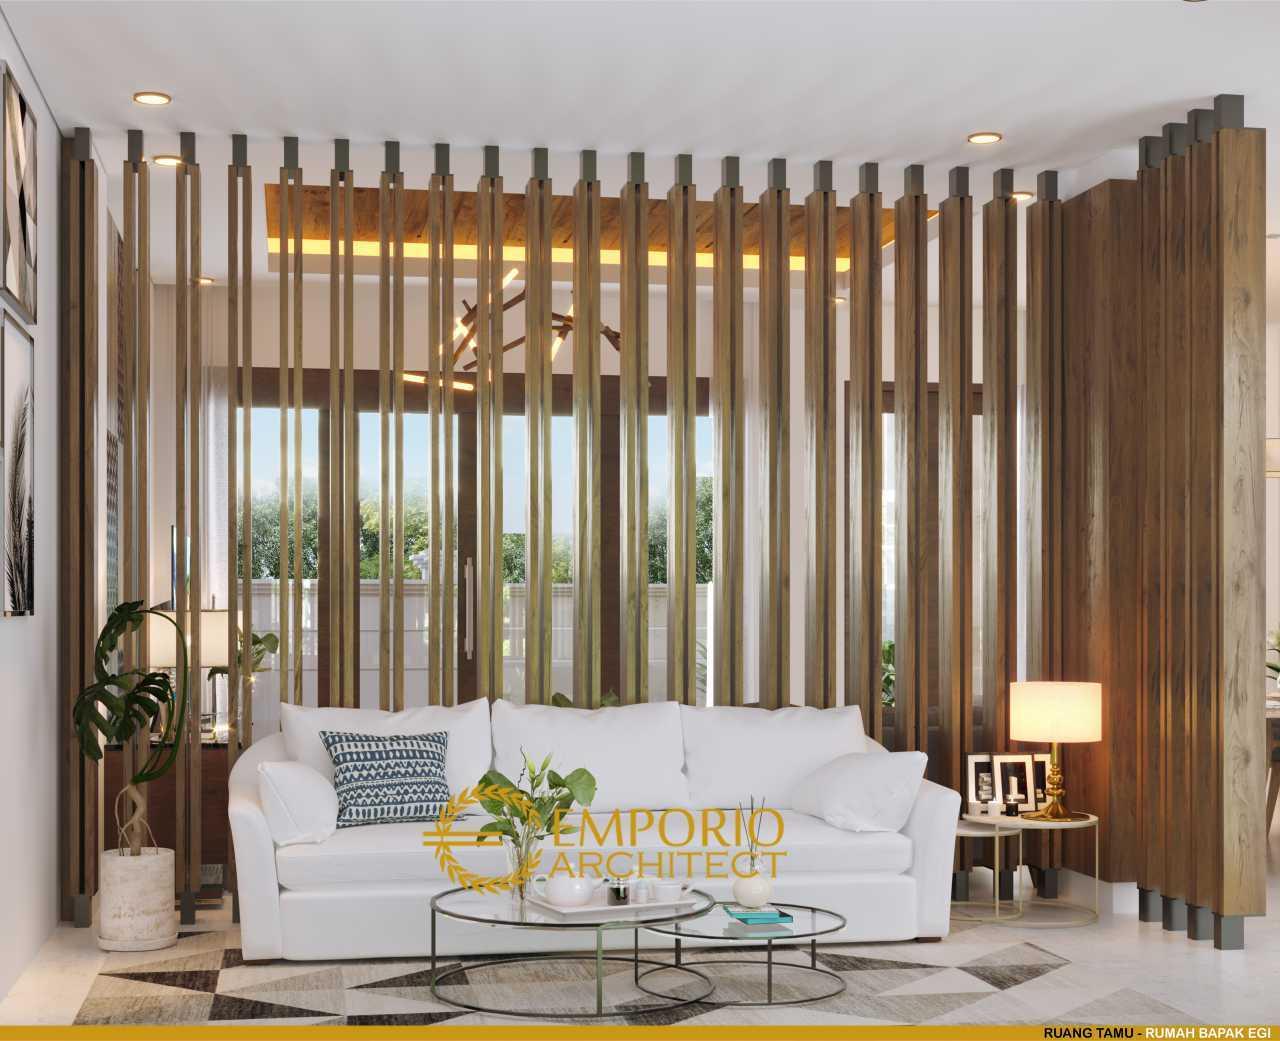 Emporio Architect Jasa Arsitek Denpasar Desain Rumah Modern Tropis 734 @ Denpasar, Bali Kota Denpasar, Bali, Indonesia Kota Denpasar, Bali, Indonesia Emporio-Architect-Jasa-Arsitek-Denpasar-Desain-Rumah-Modern-Tropis-734-Denpasar-Bali  85480